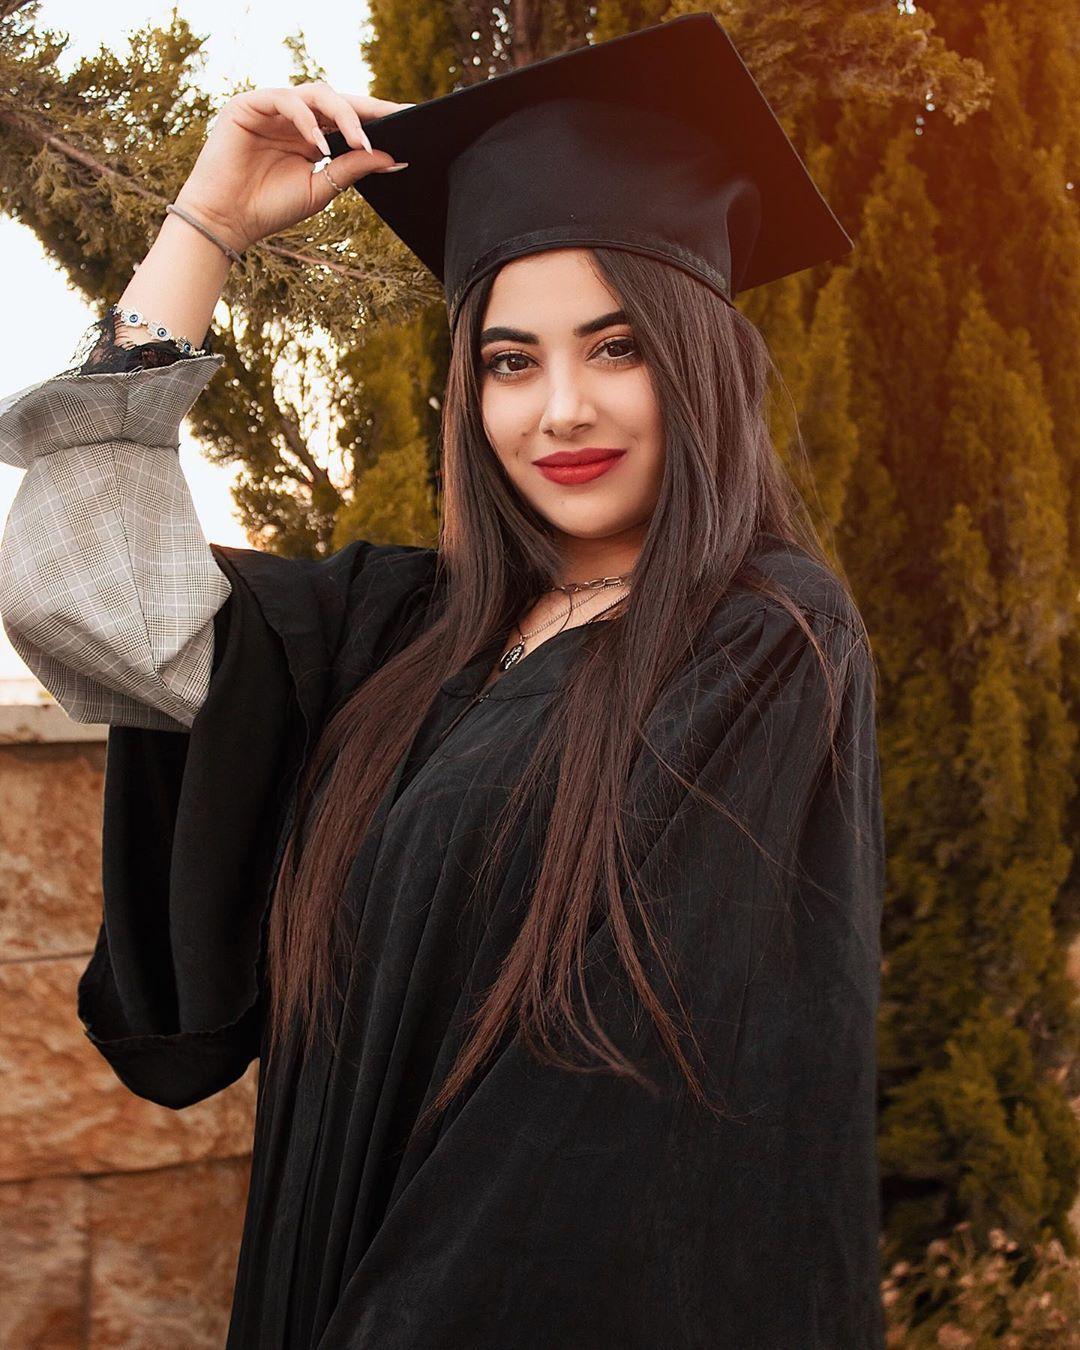 Graduationday Photographer Picoftheday College Fashion Zgenration Graduation202 Graduation Pictures Fashion Photography Graduation Day